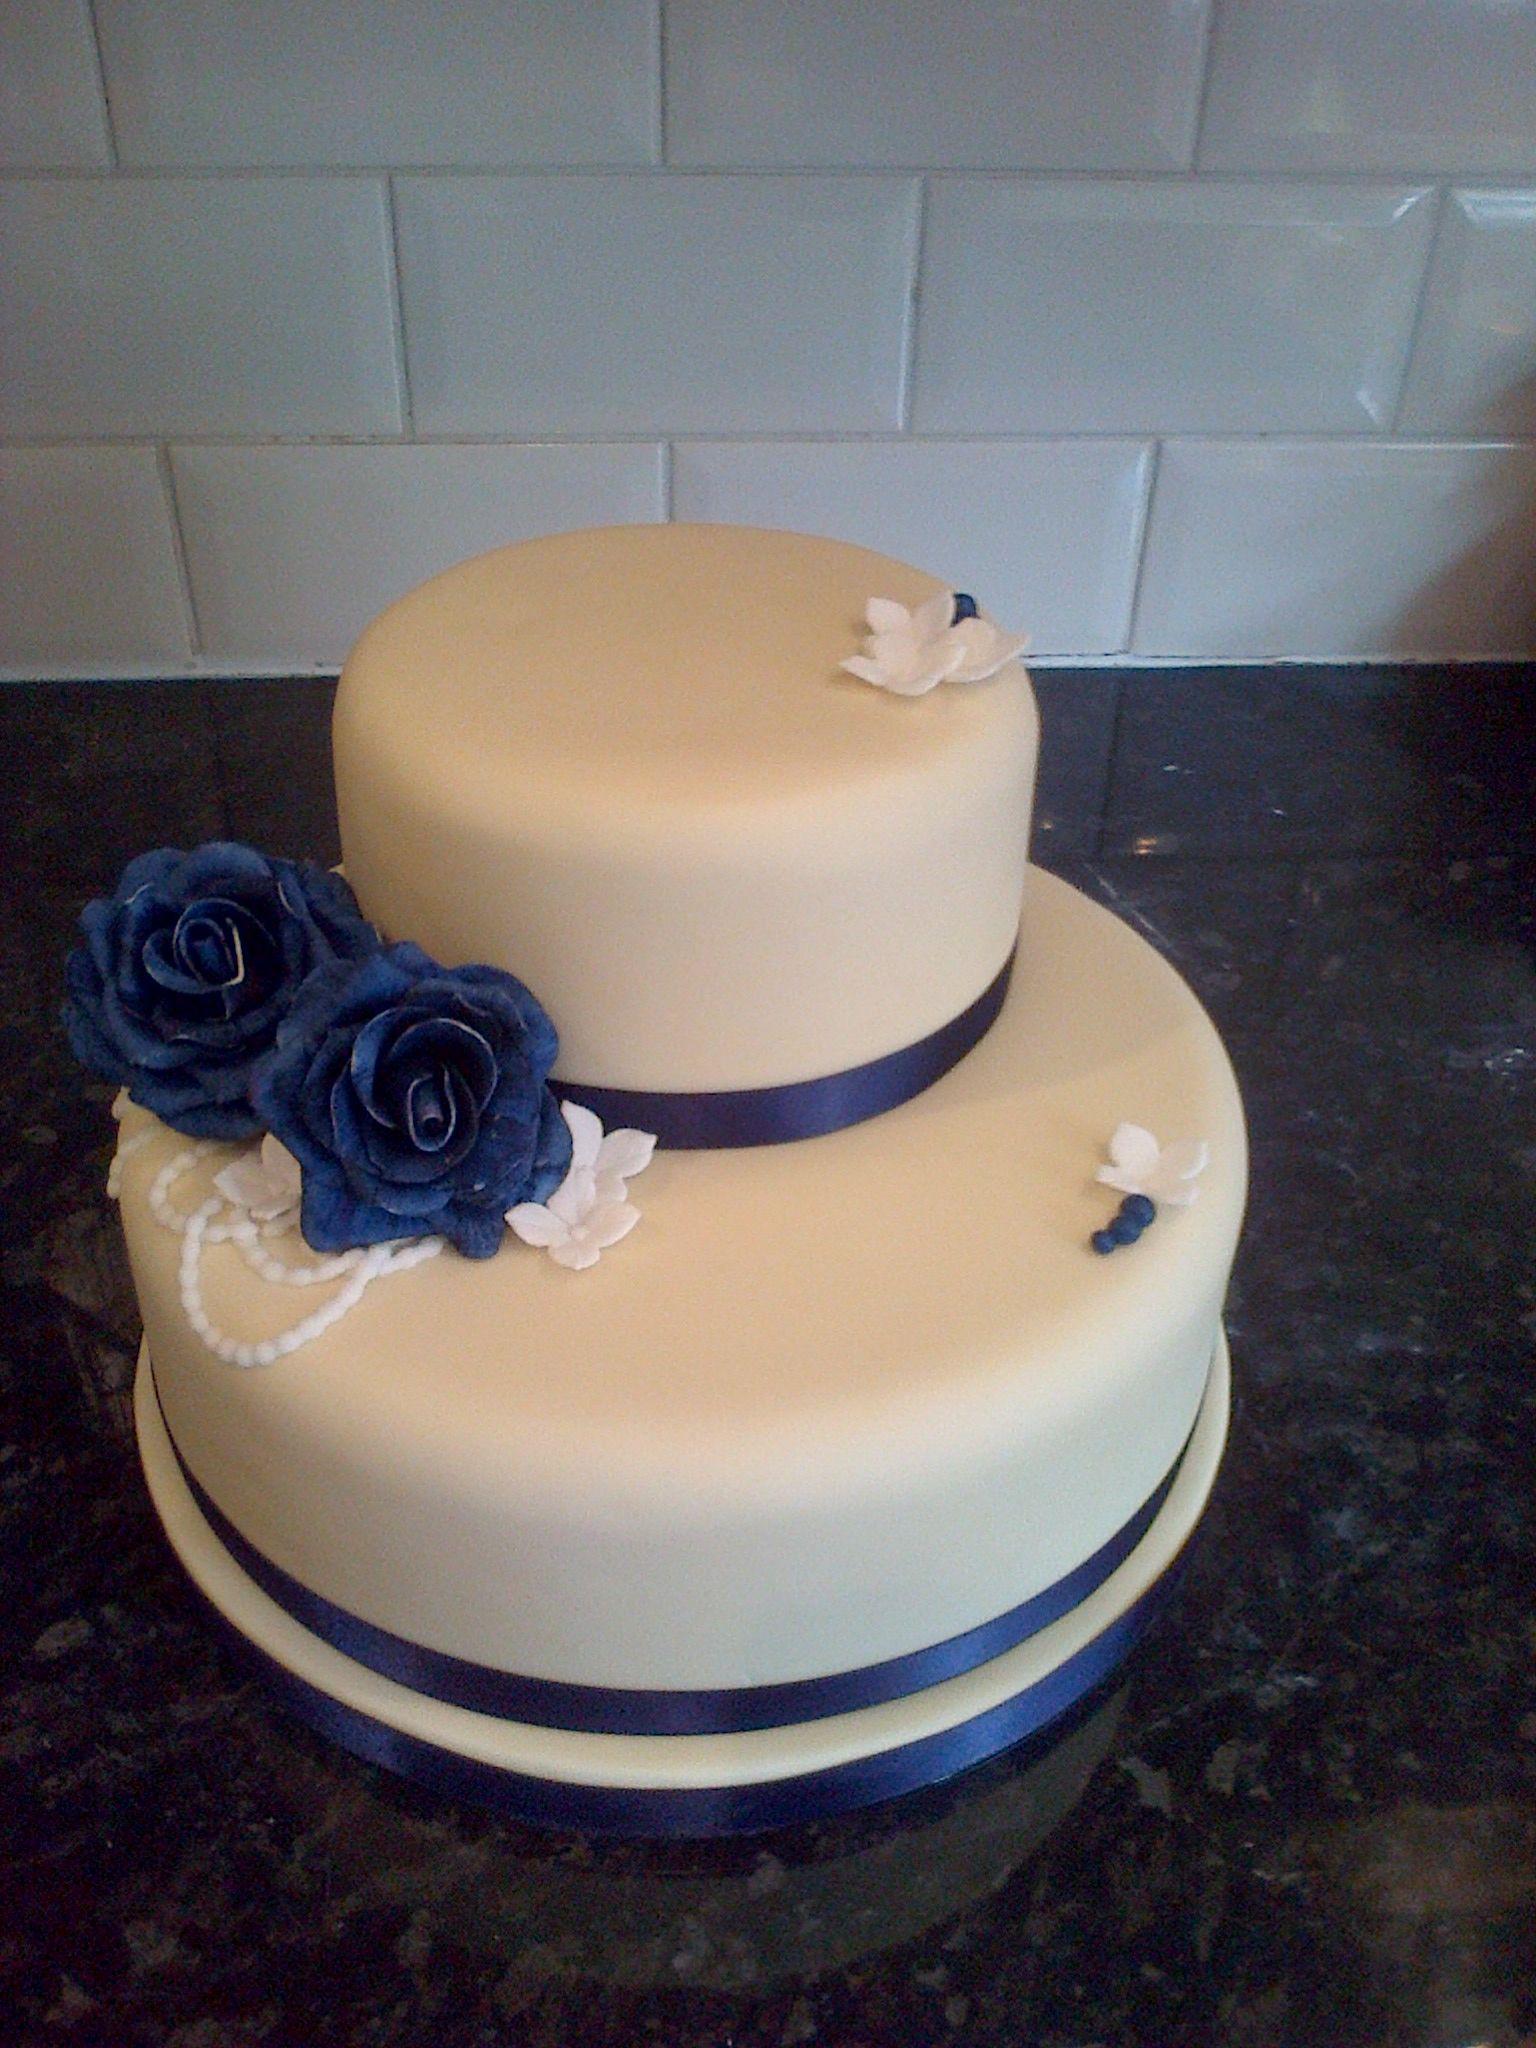 Small Cream U Navy Blue Wedding Cake Take Me To The Temple - Small Blue Wedding Cakes